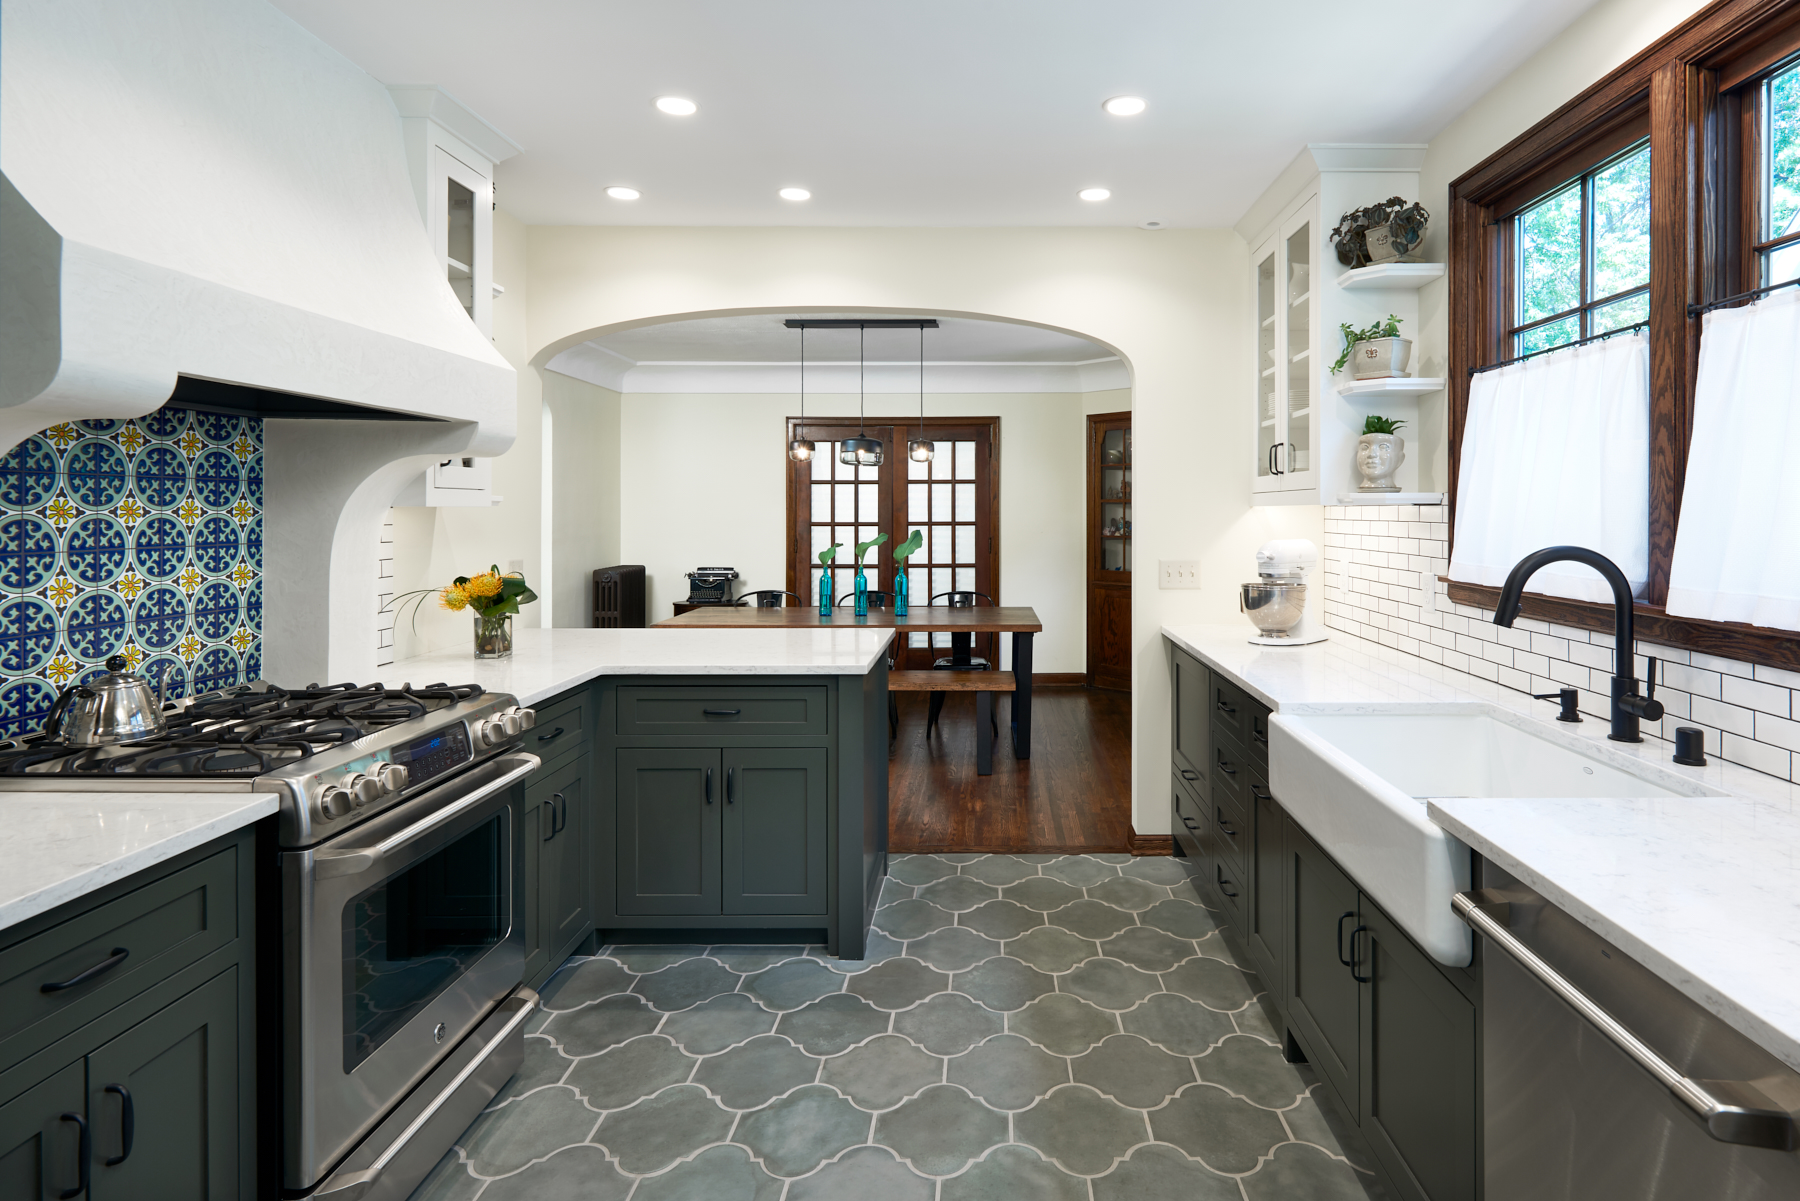 Kitchen renovation and interior design by NewStudio Architecture